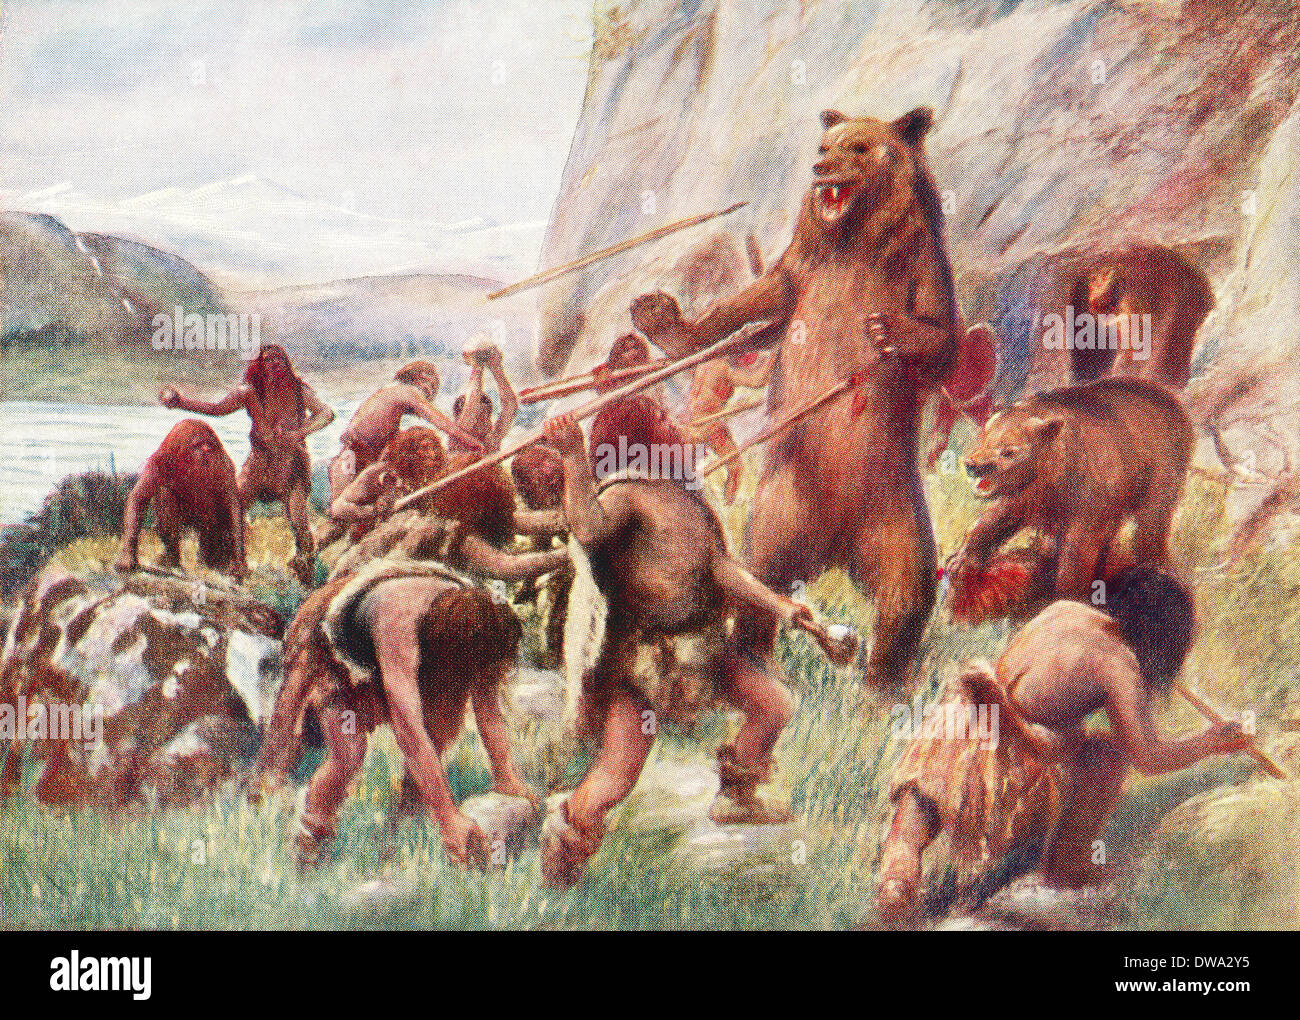 Stone age man hunting wild bears. - Stock Image